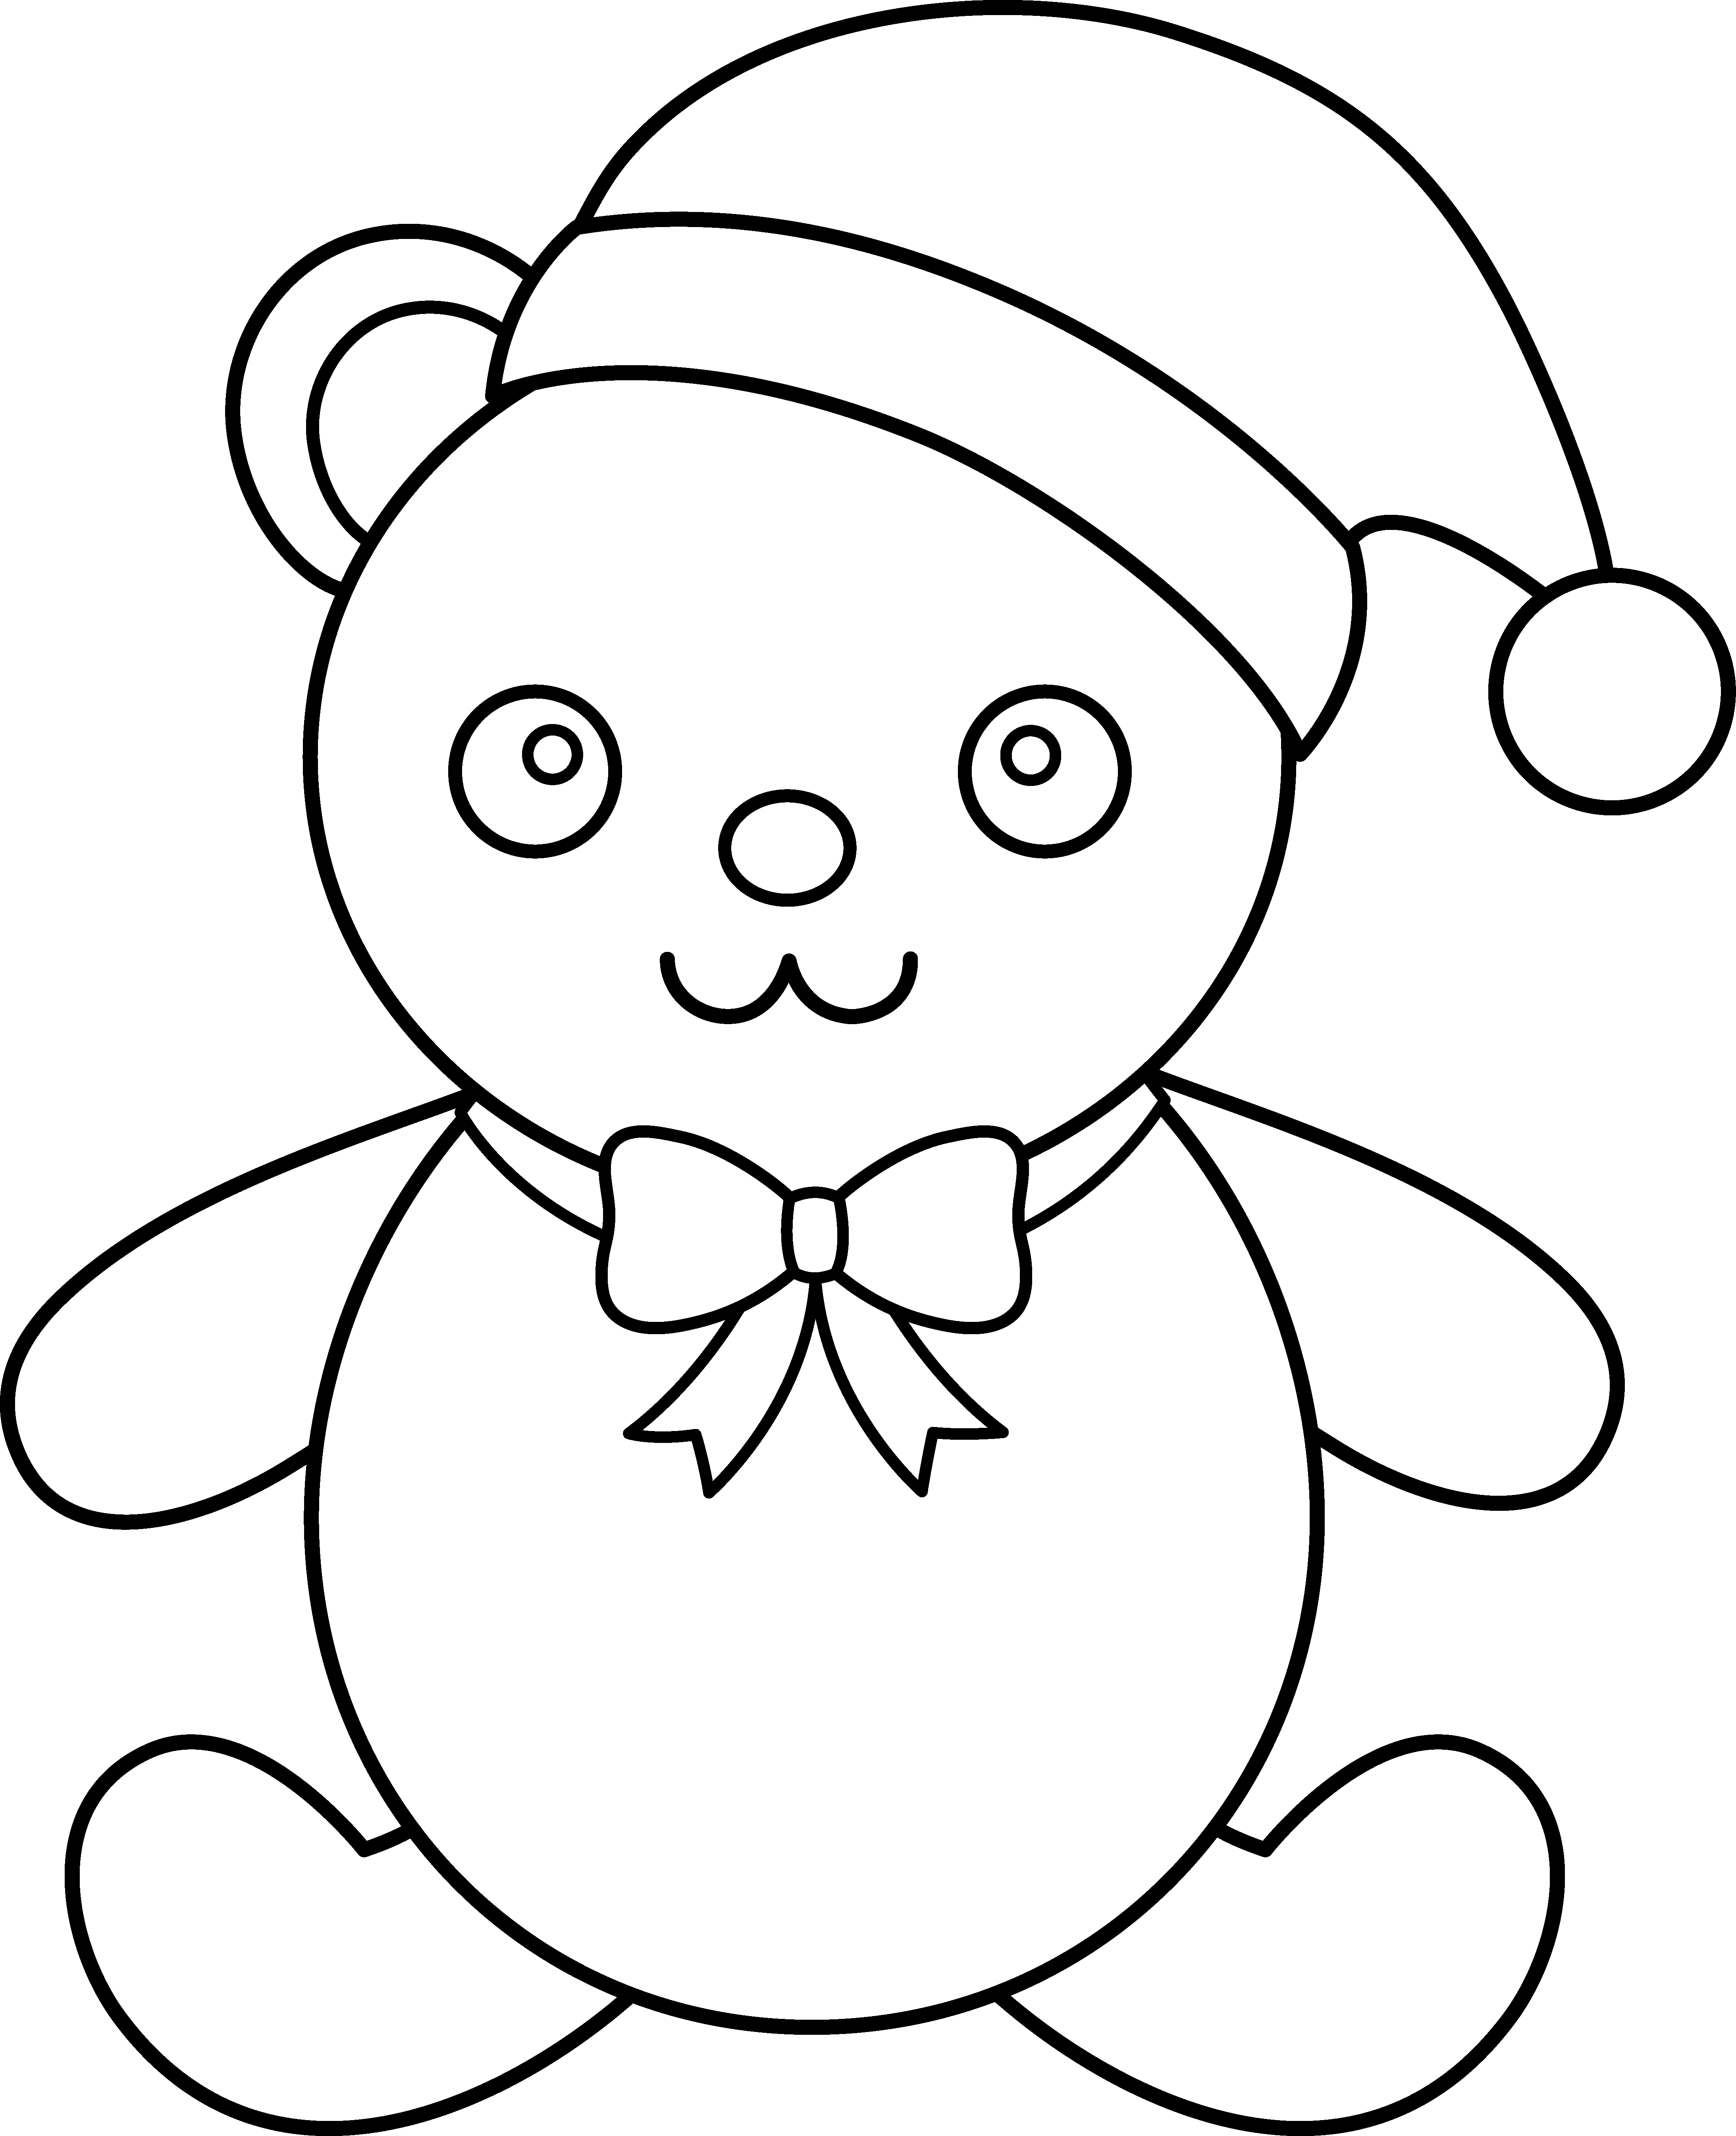 Christmas teddy bear clipart image free stock Christmas Teddy Bear Line Art - Free Clip Art image free stock